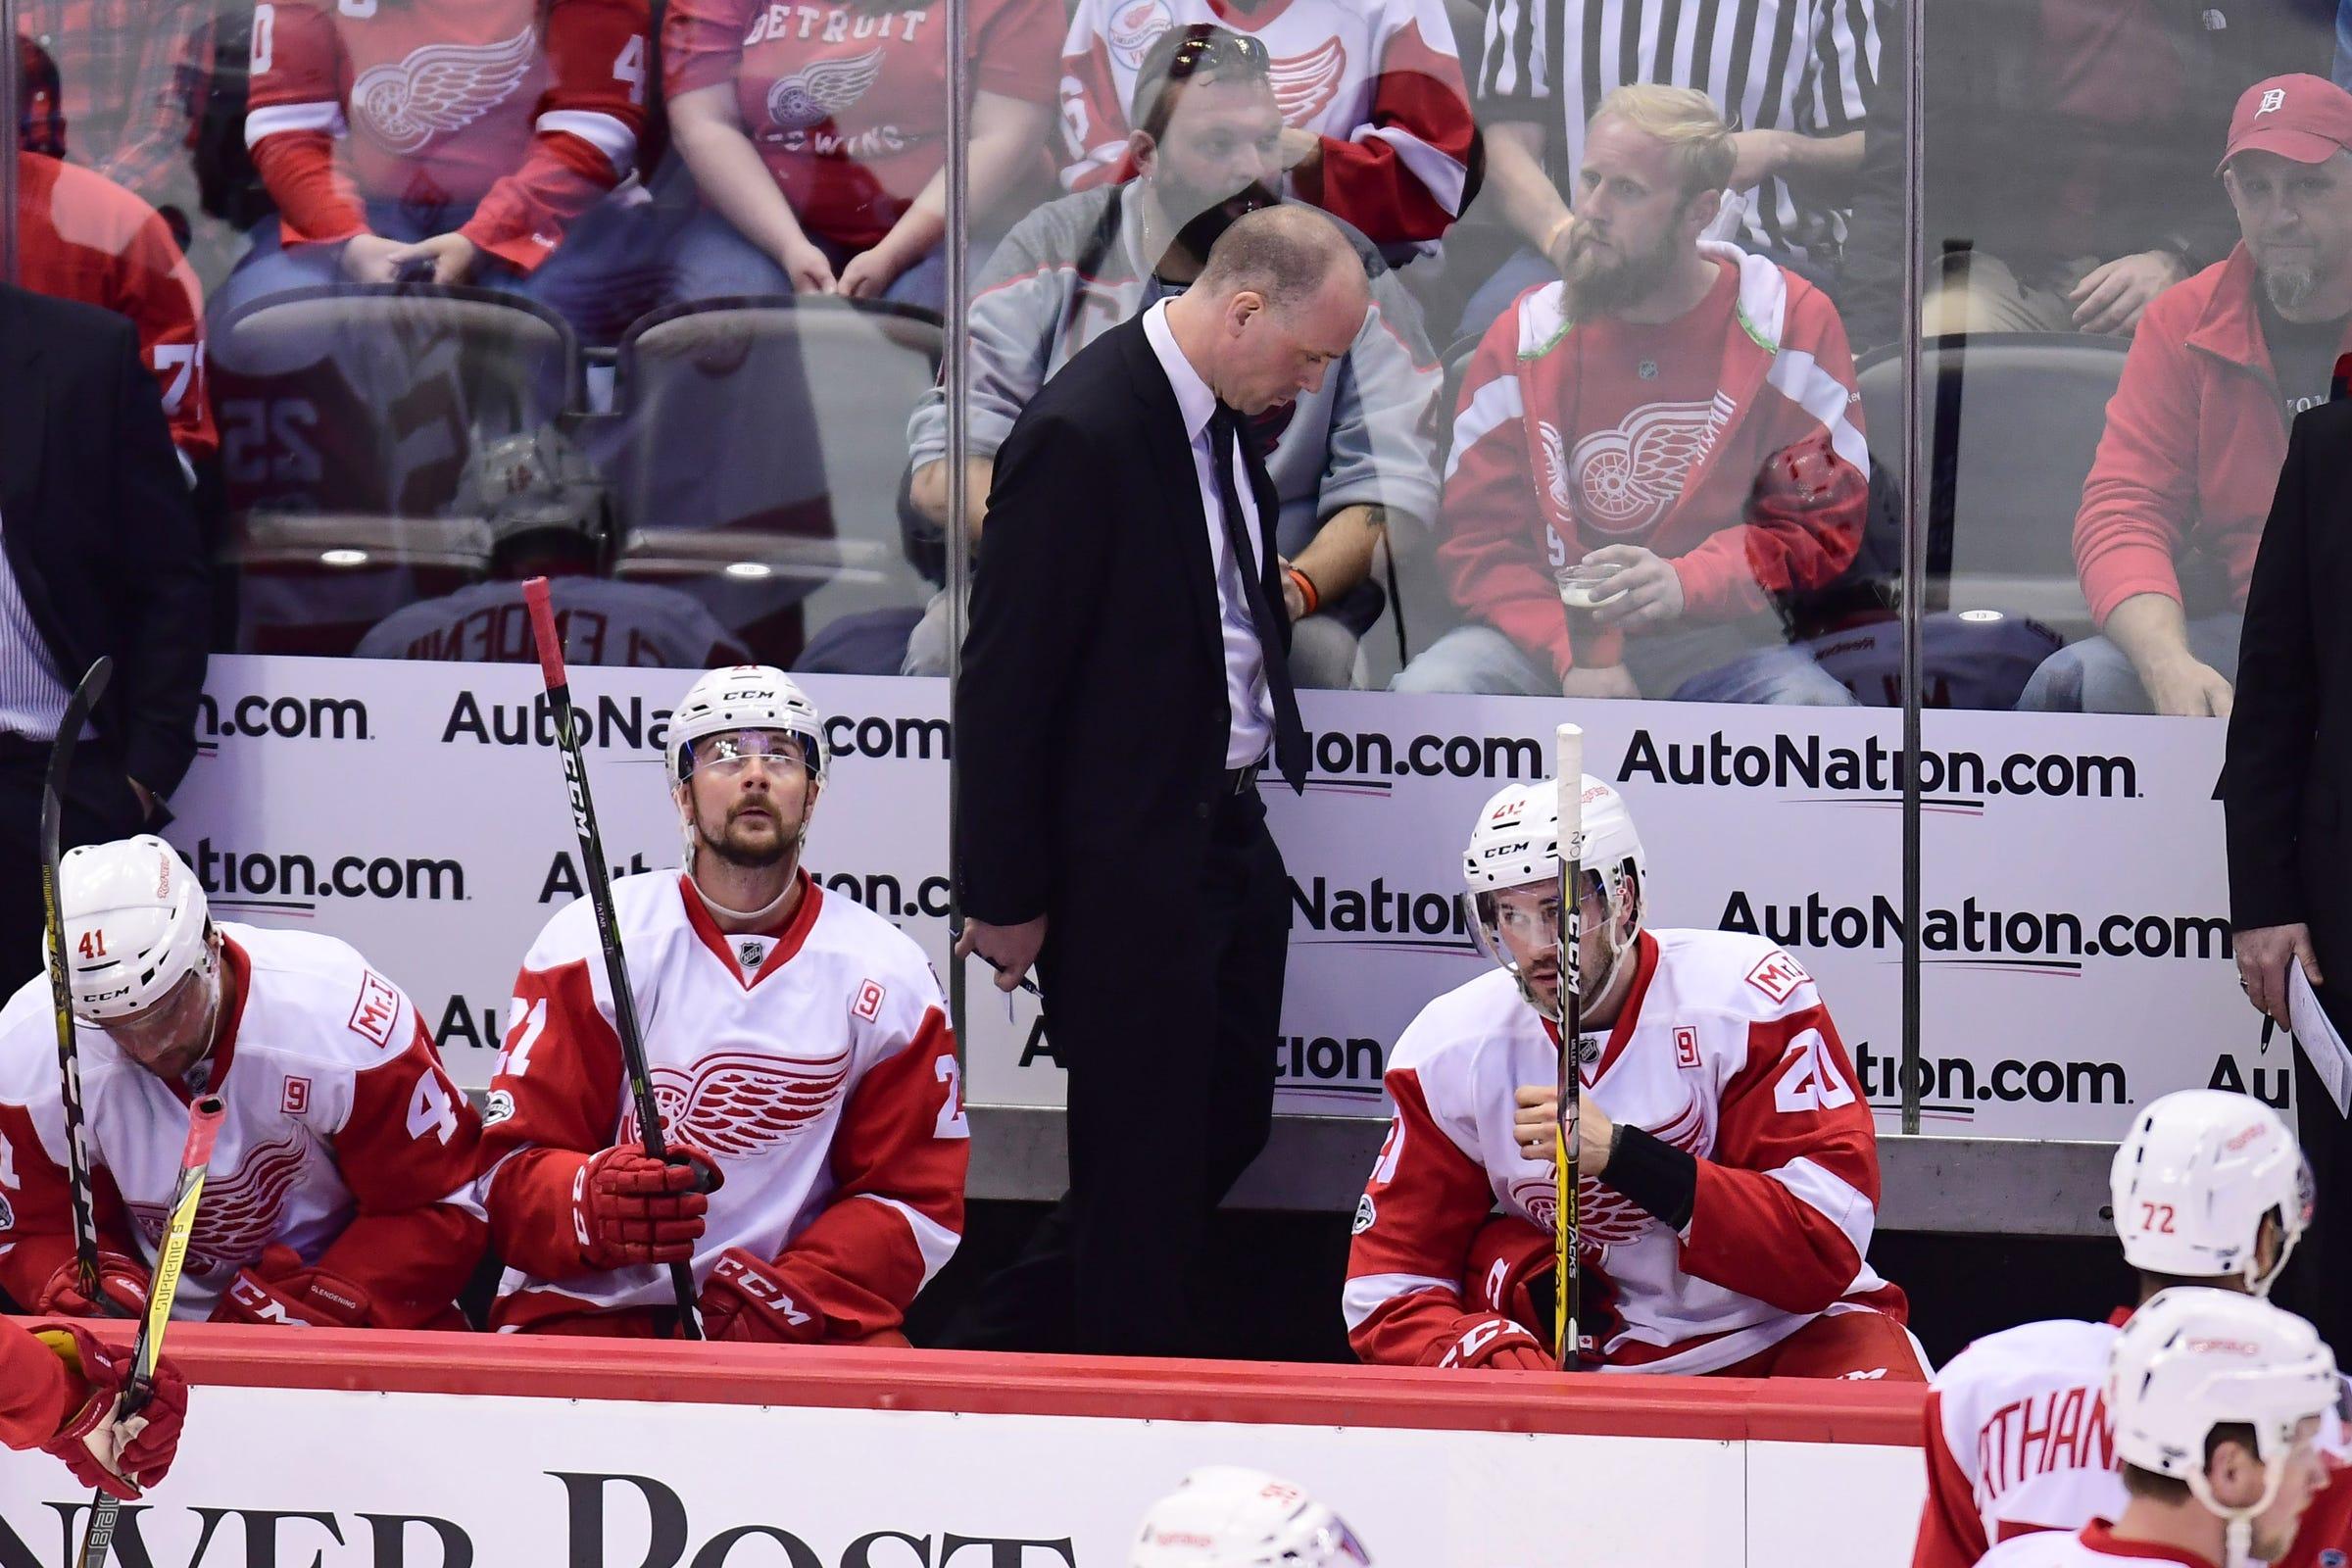 Detroit Red Wings' Jeff Blashill: 'This isn't OK'